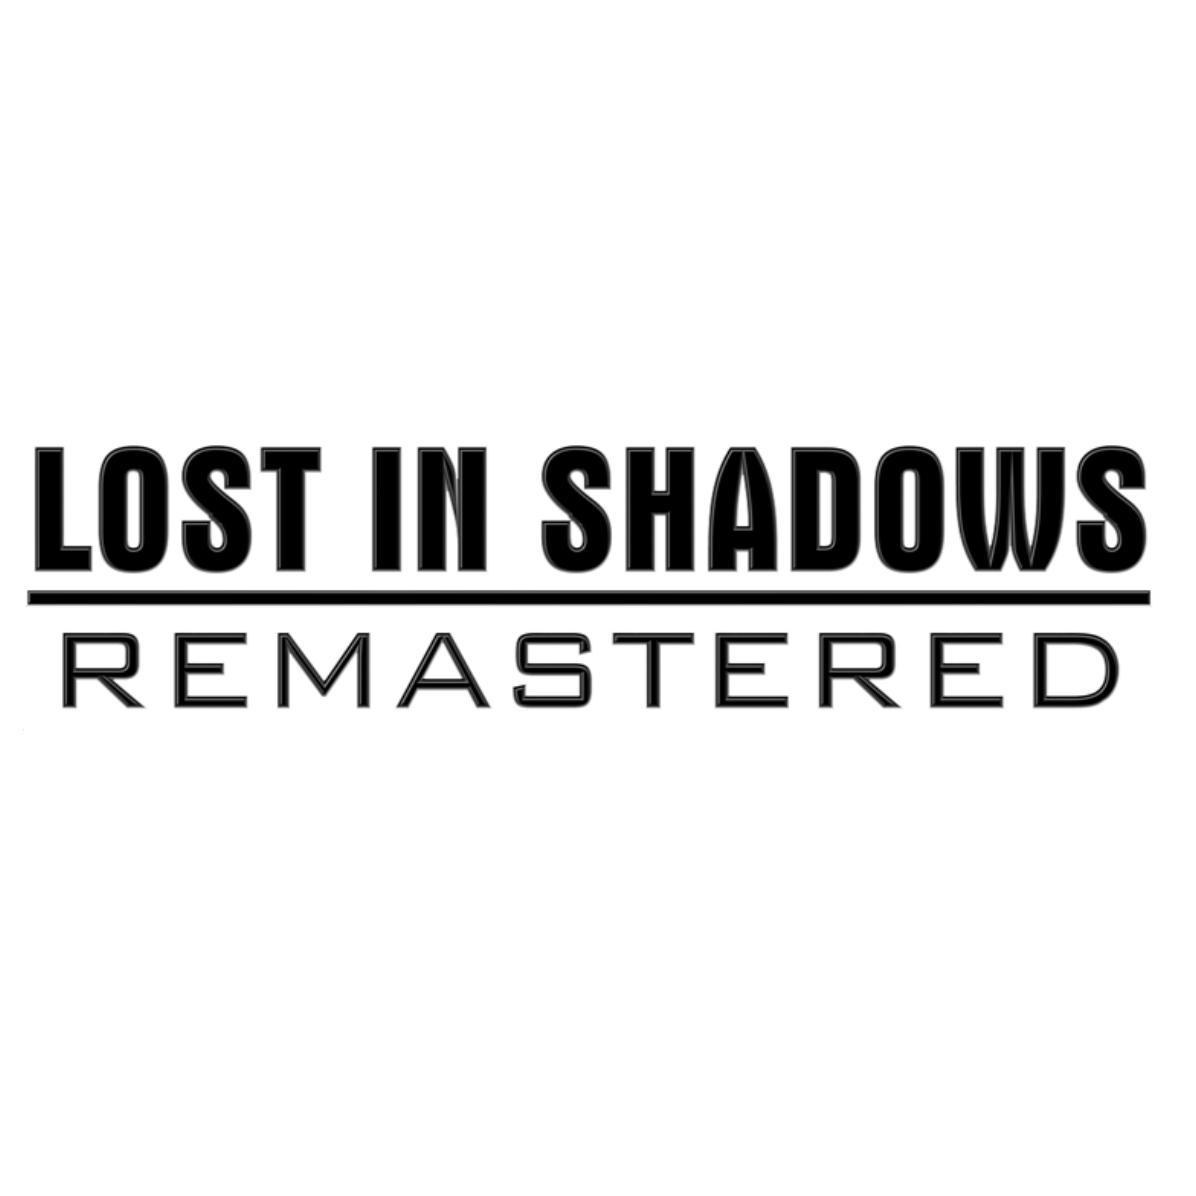 LOST IN SHADOWS